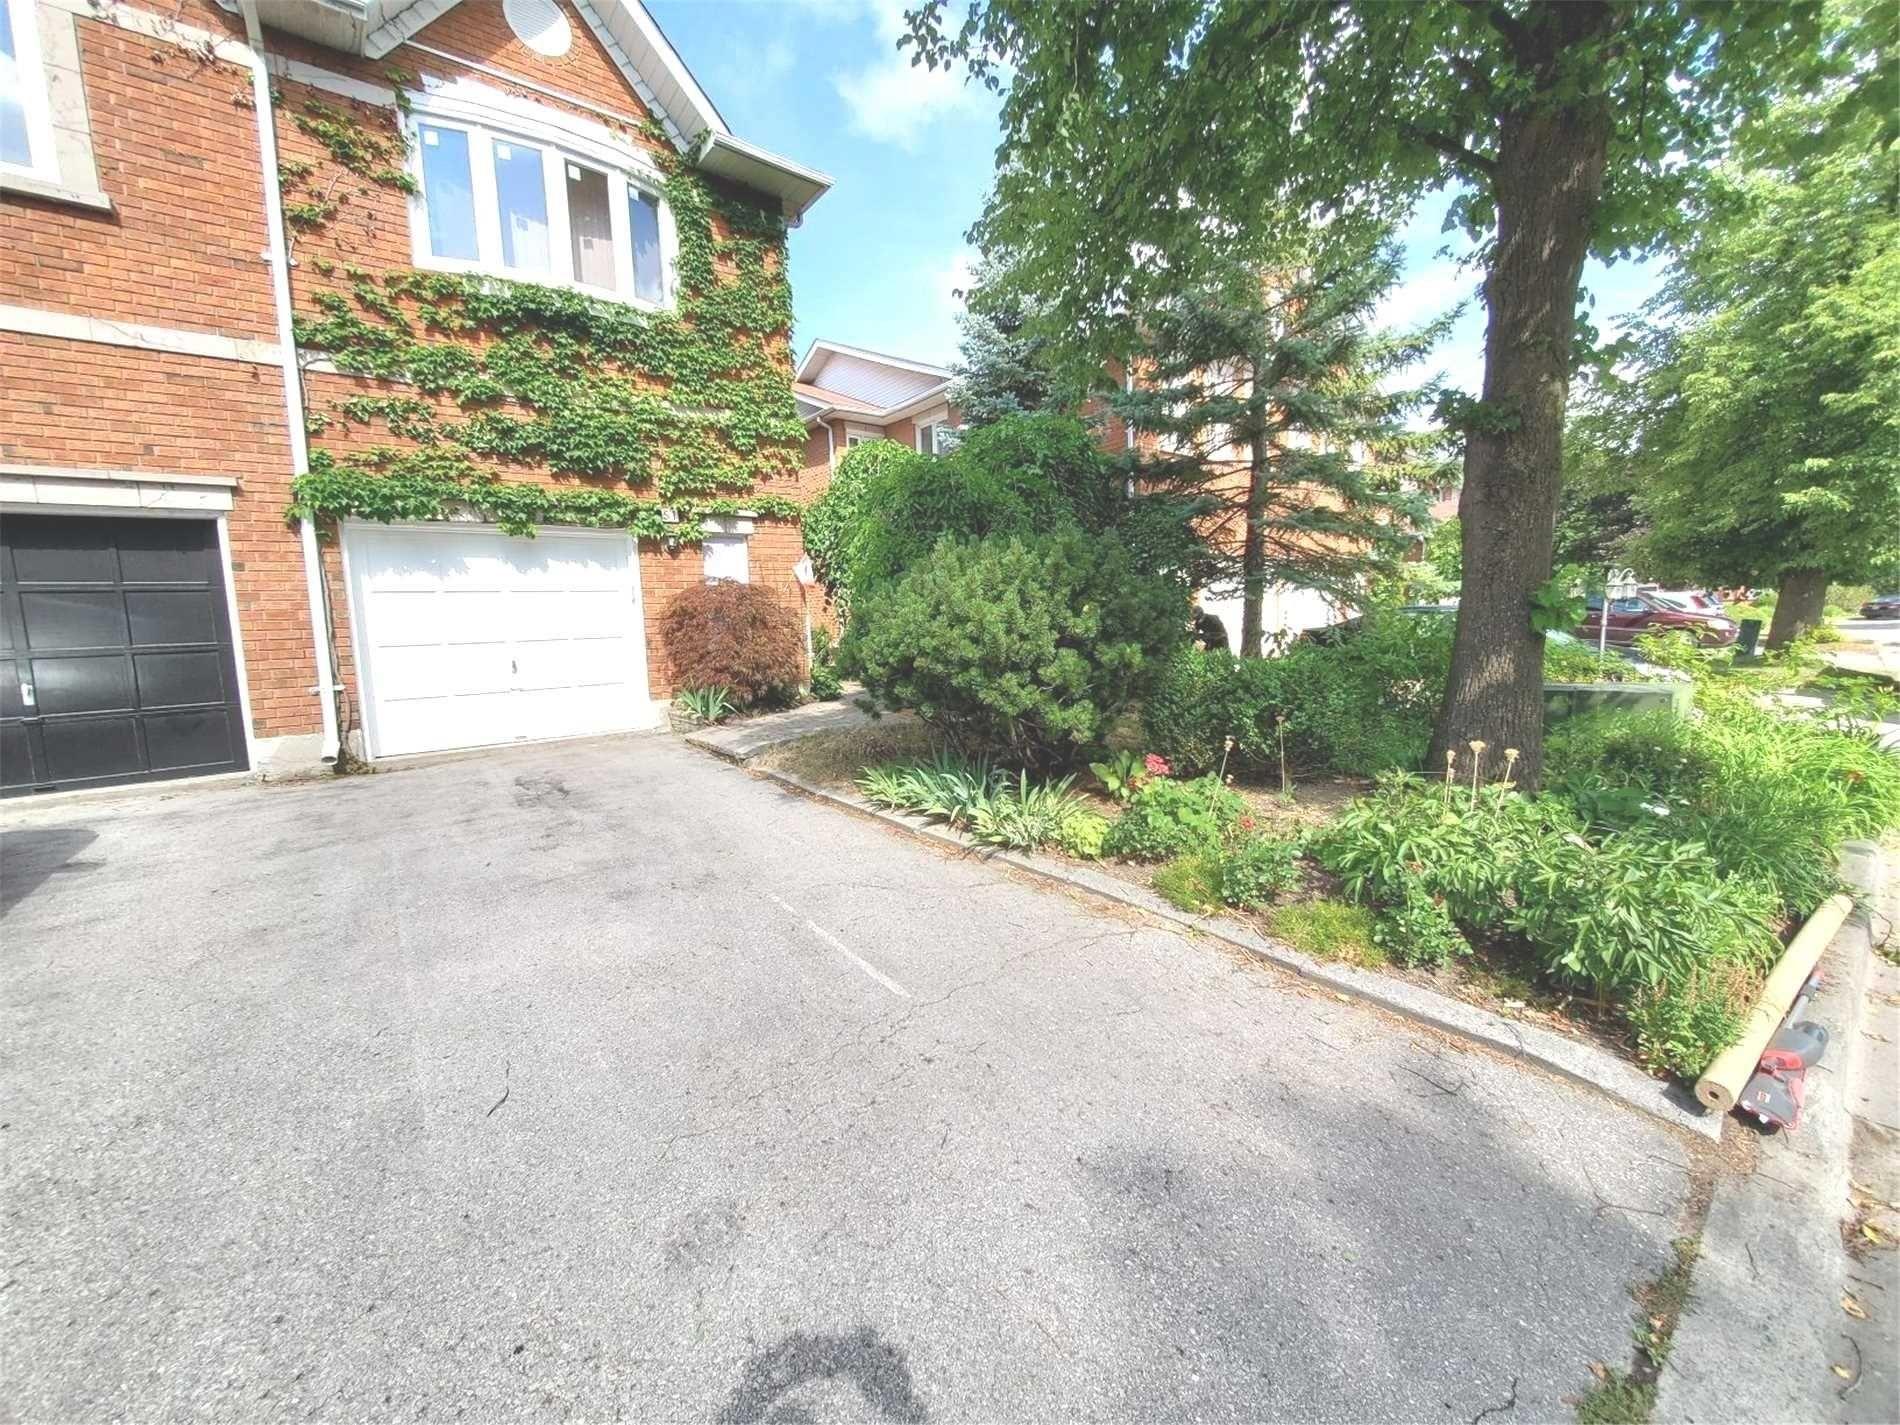 Main Photo: 51 Brownstone Circle in Vaughan: Crestwood-Springfarm-Yorkhill House (2-Storey) for lease : MLS®# N5383654